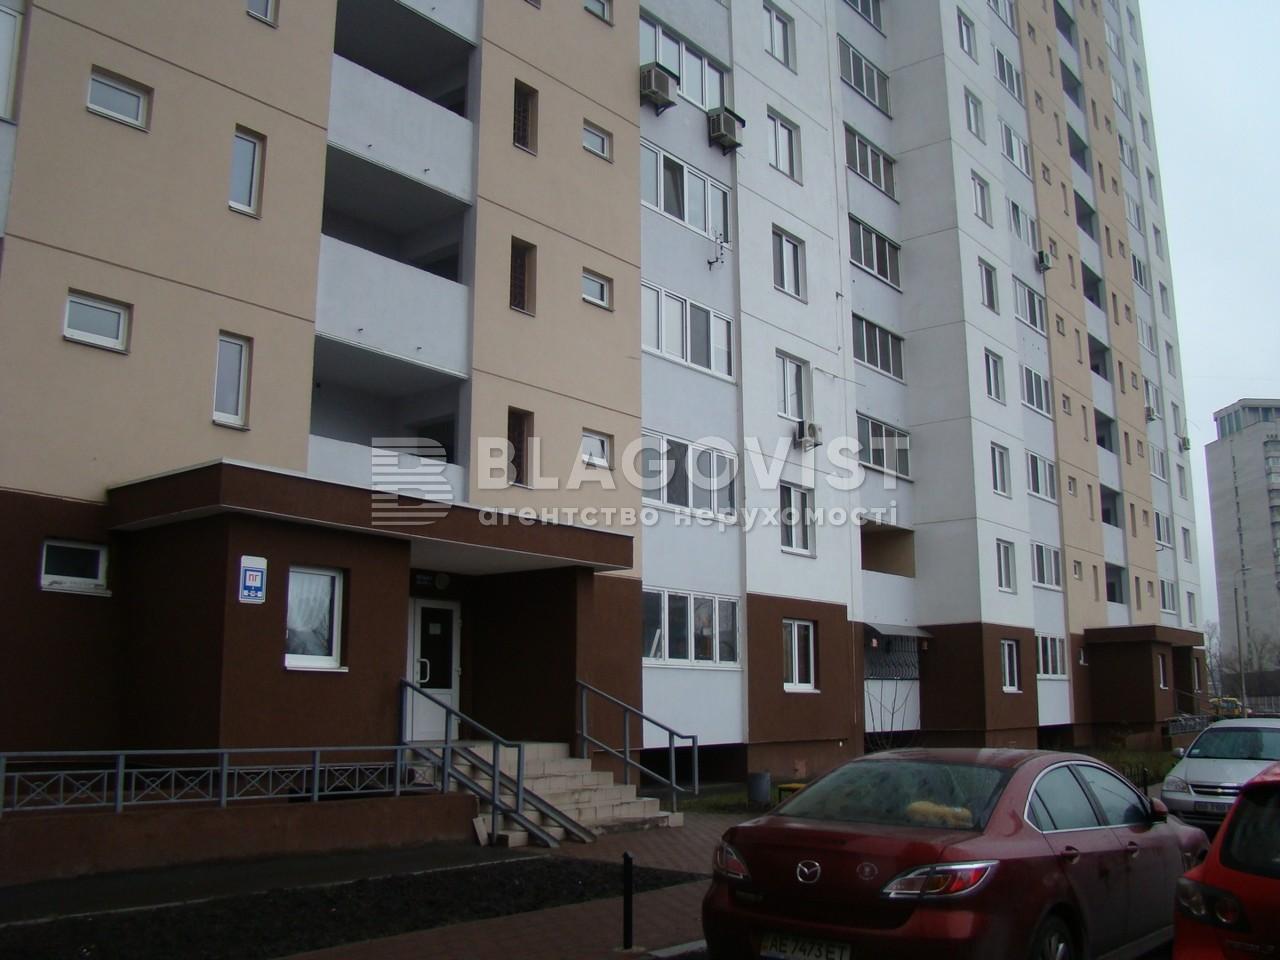 Квартира C-103985, Урловская, 38, Киев - Фото 4